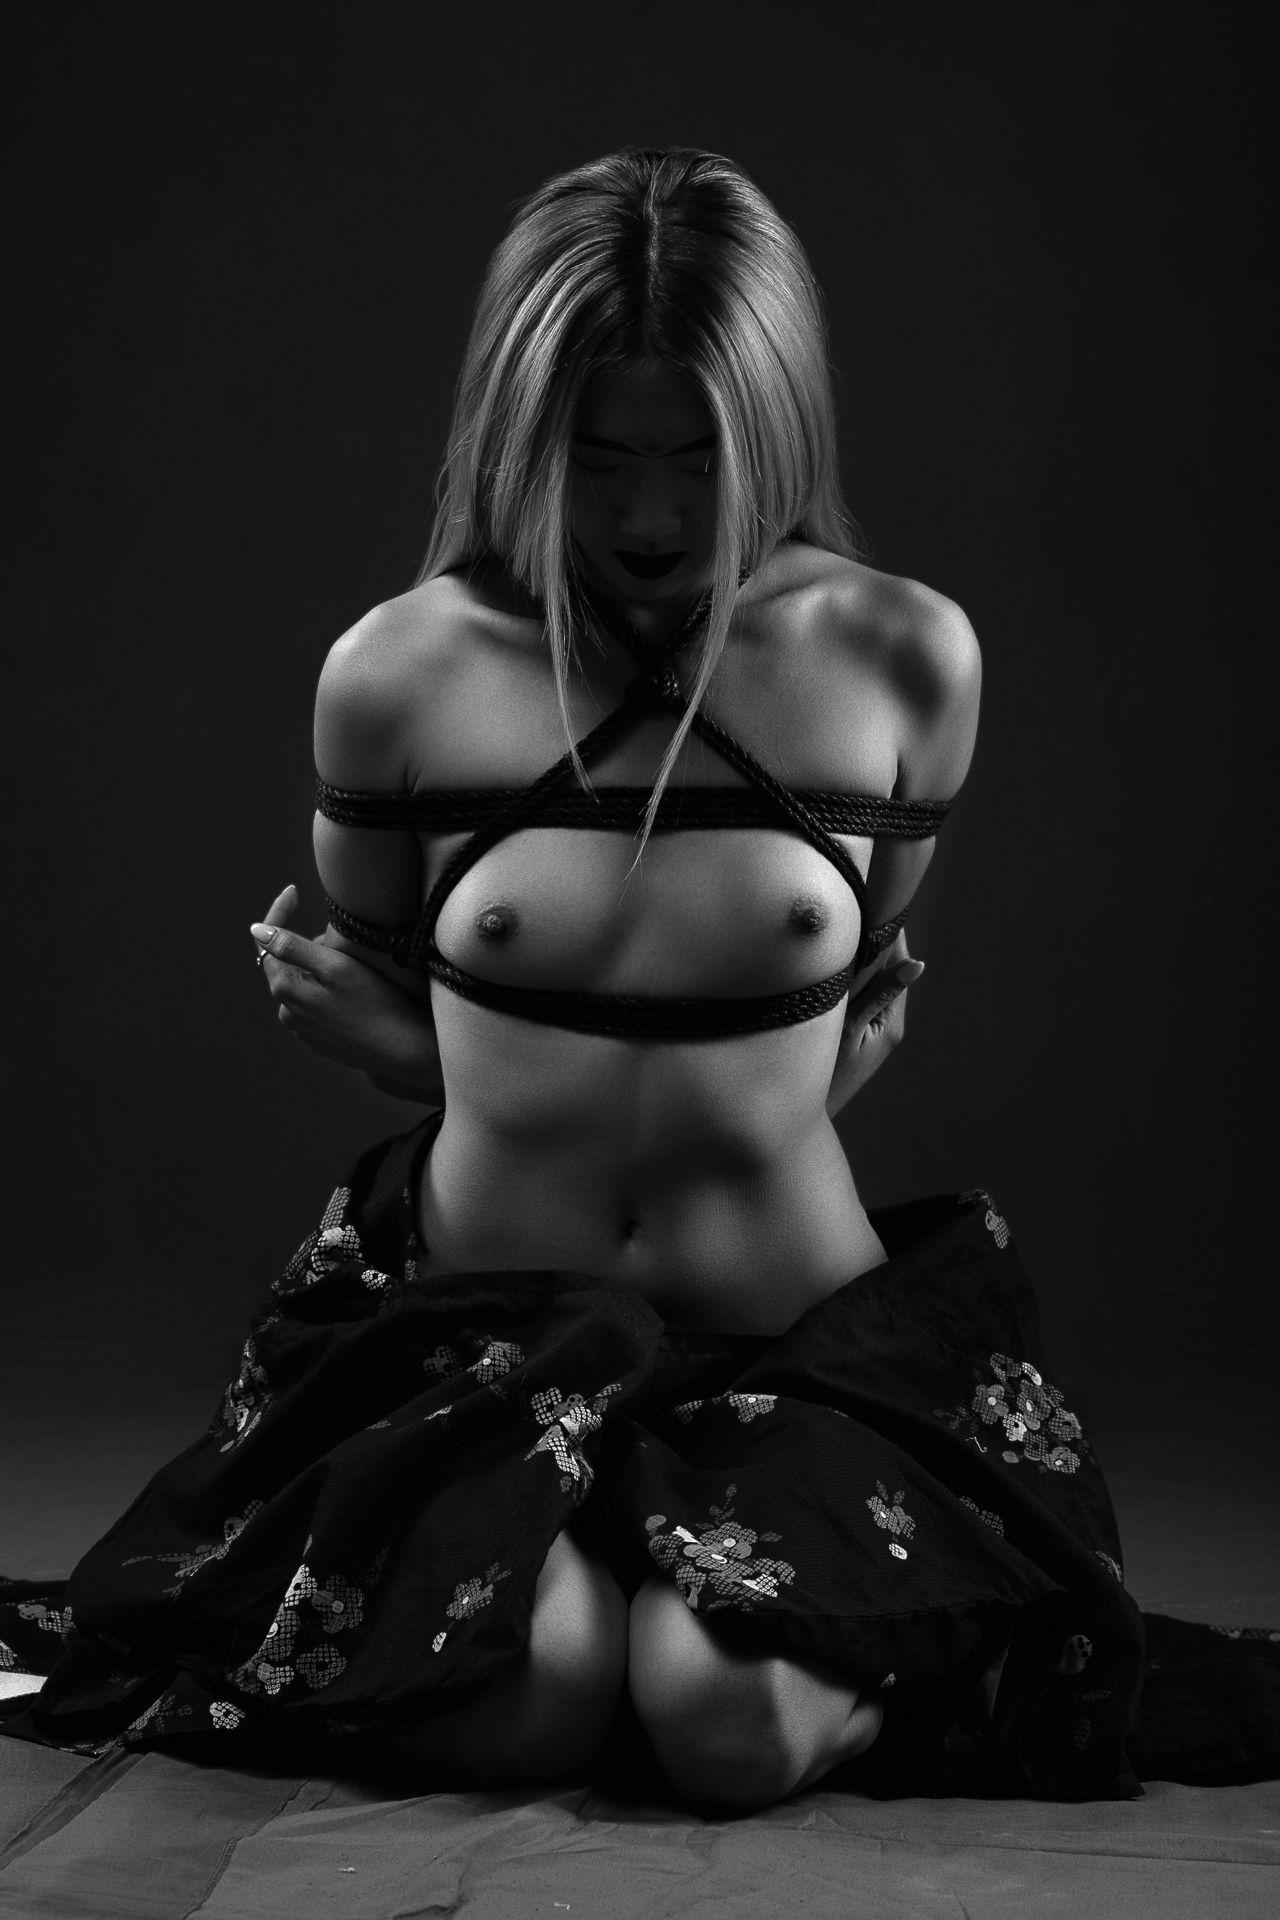 nude, shibari, black and white, Romanov Yury